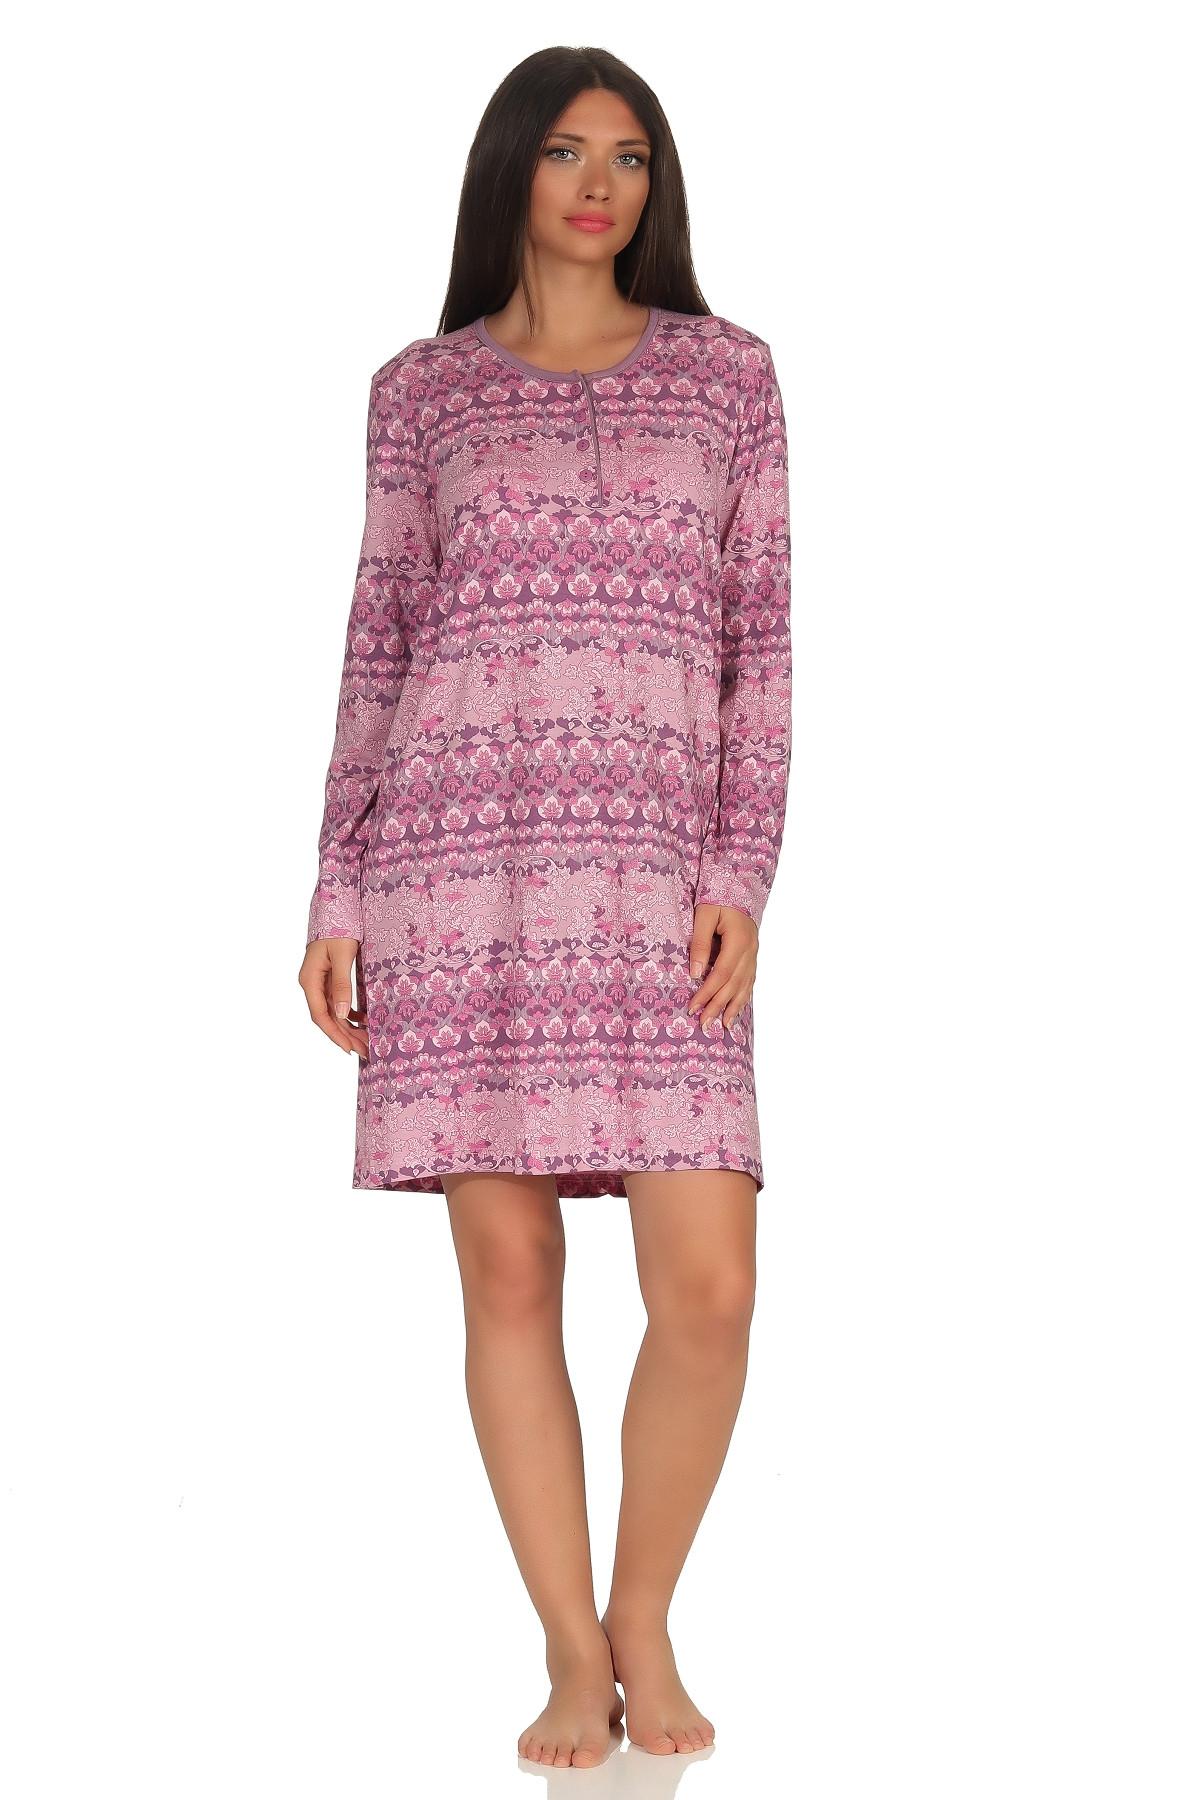 Dames nachthemd Normann 90419-XL 48/50-Lila